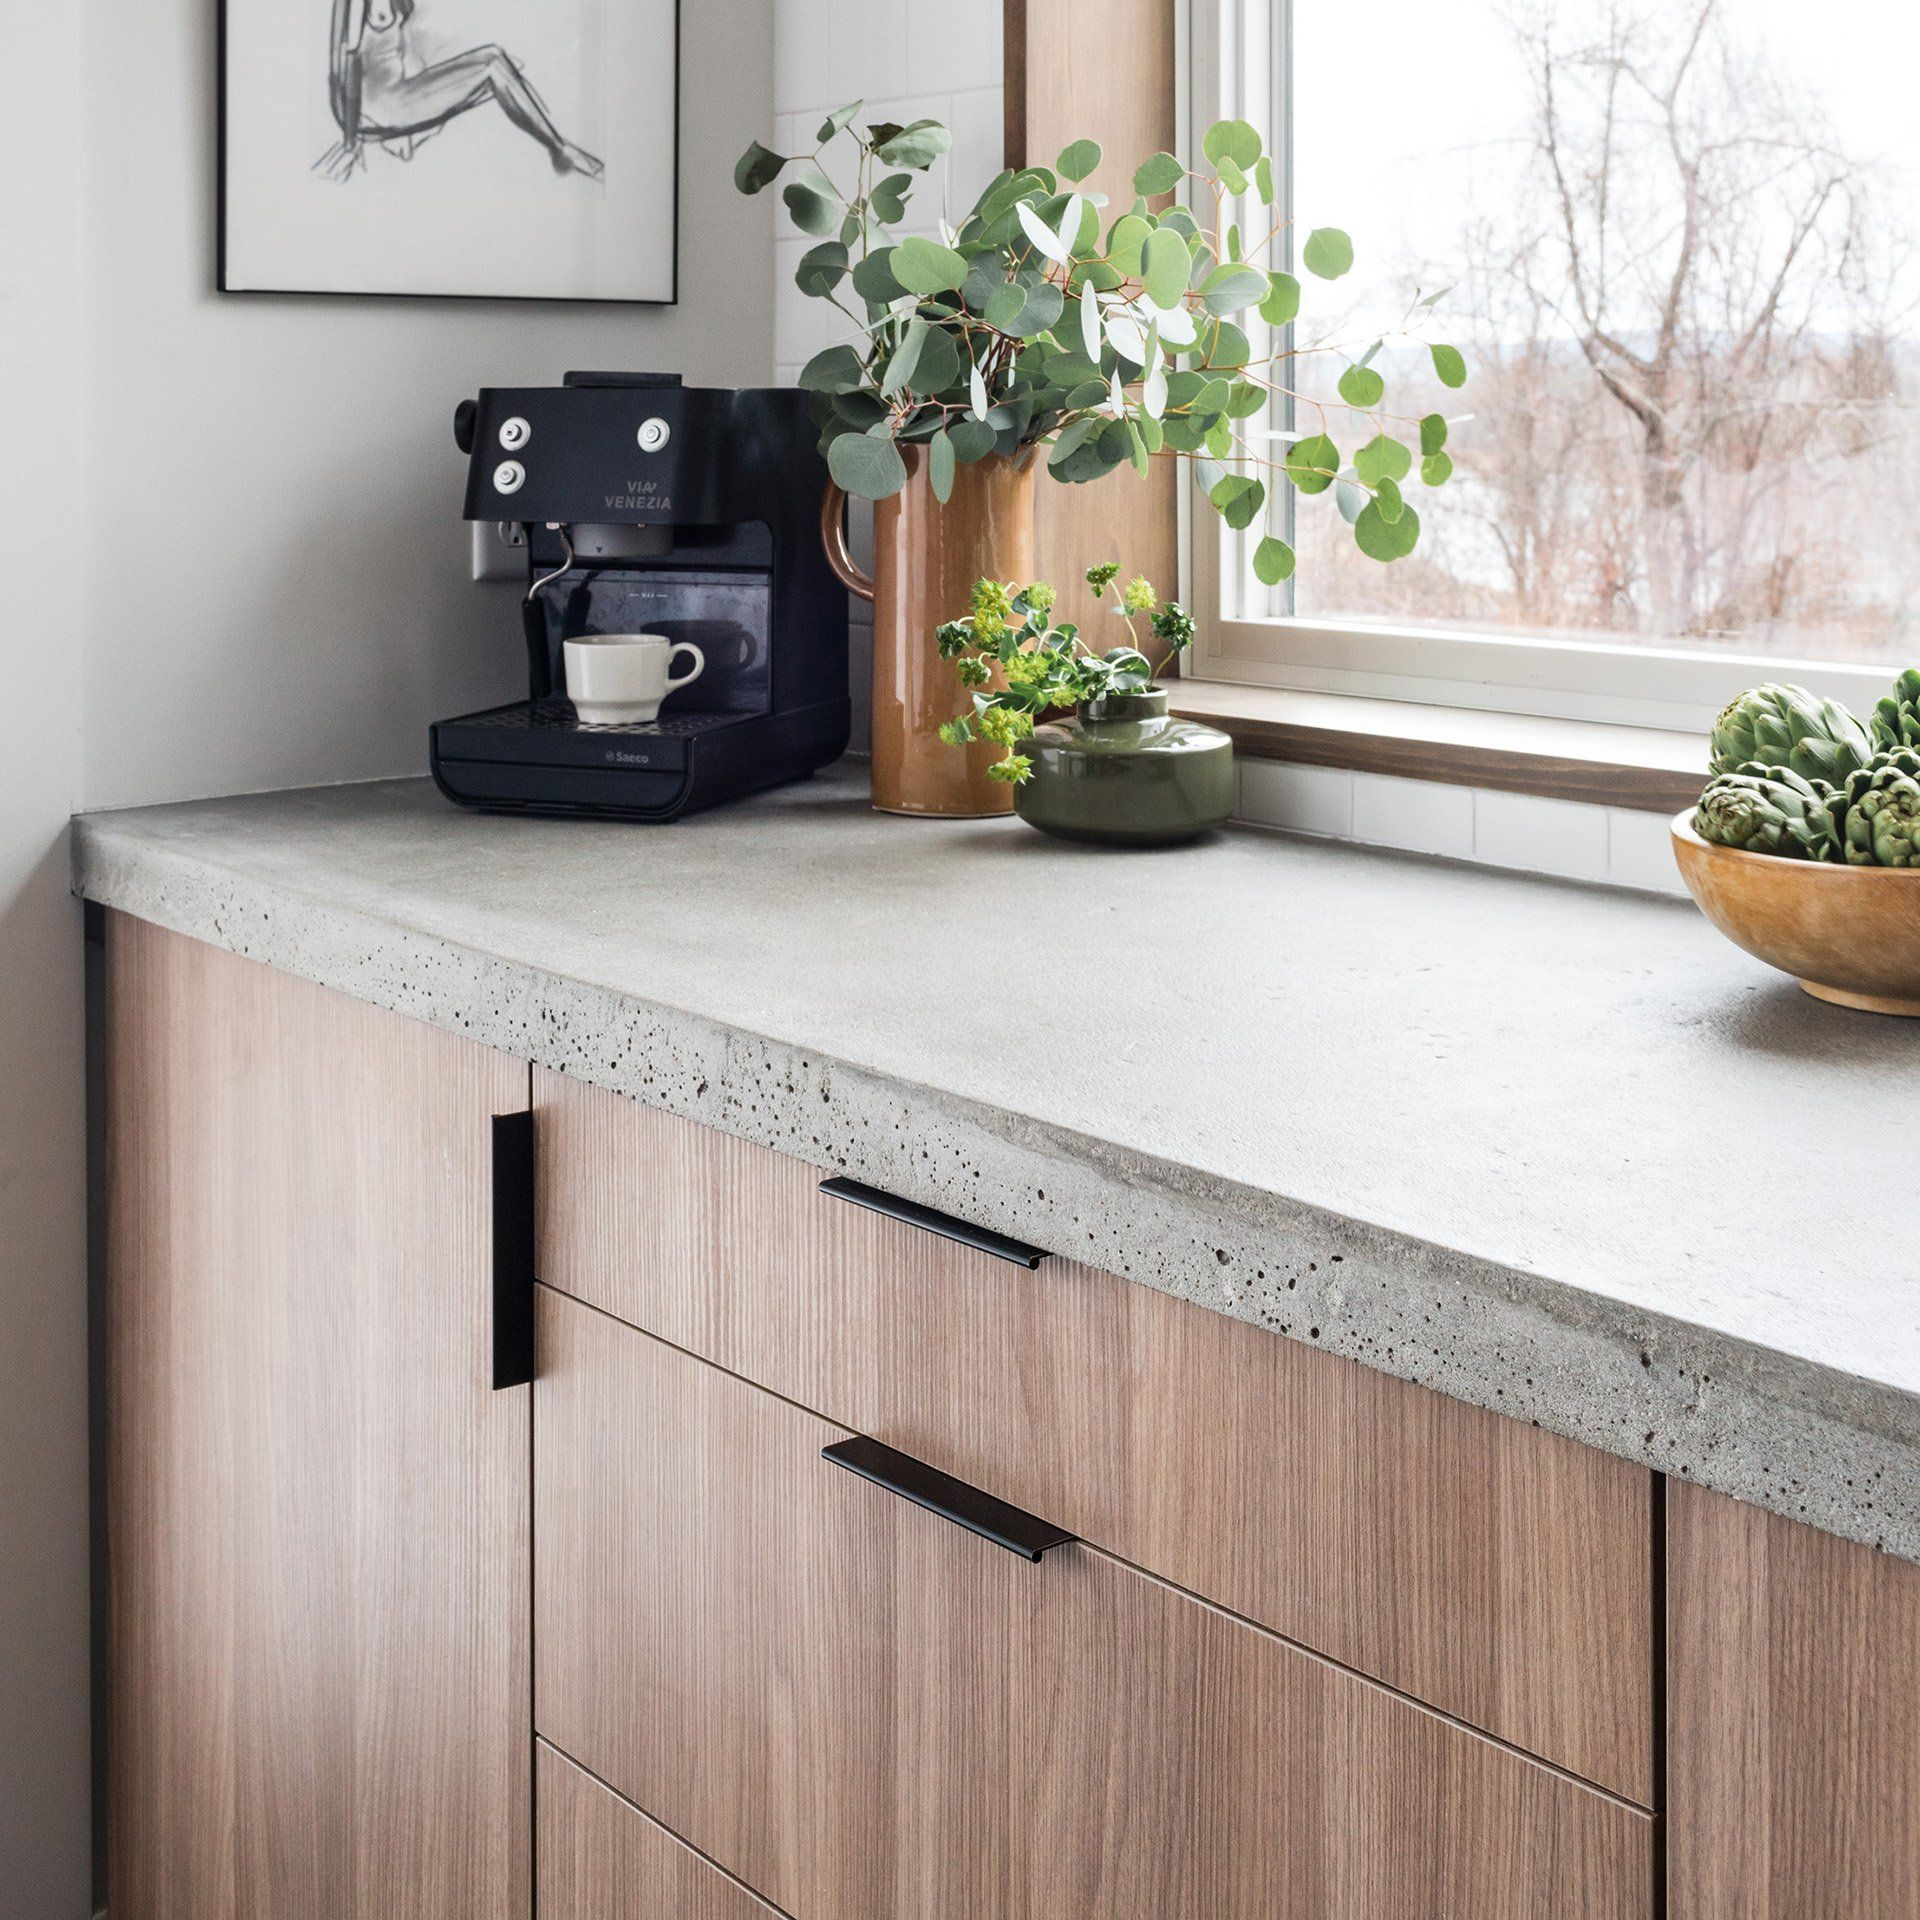 An EcoFriendly, Elevated Ikea Kitchen - Modern zen kitchen, Zen kitchen, Home decor kitchen, Kitchen design, Kitchen remodel, Ikea kitchen - Design Shannon Tate Photographer Joyelle West Location Massachusetts